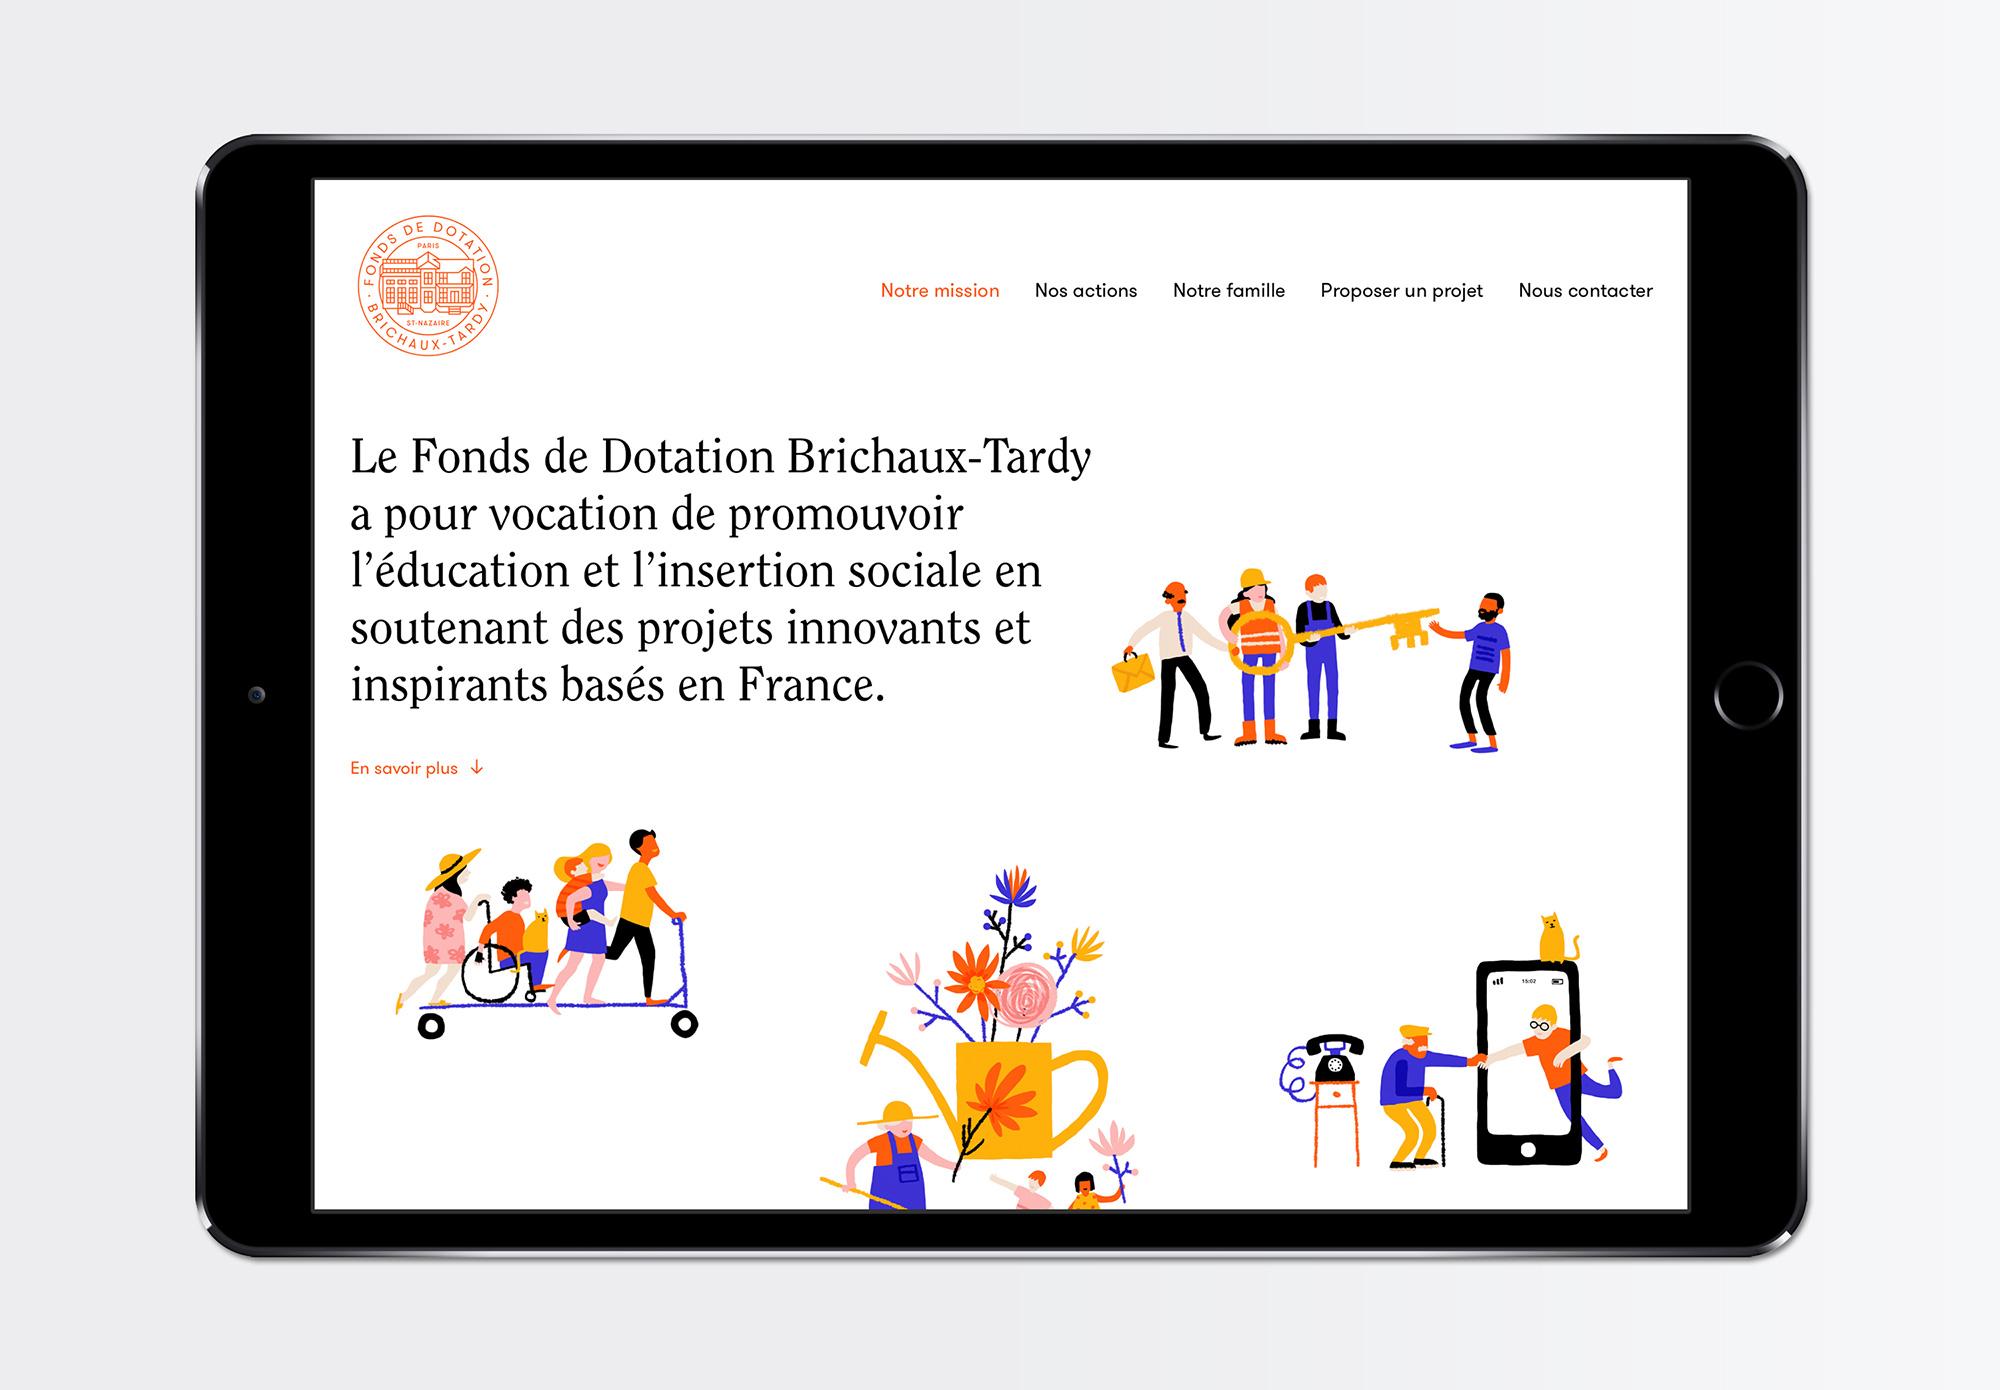 Fondation Brichaux-Tardy